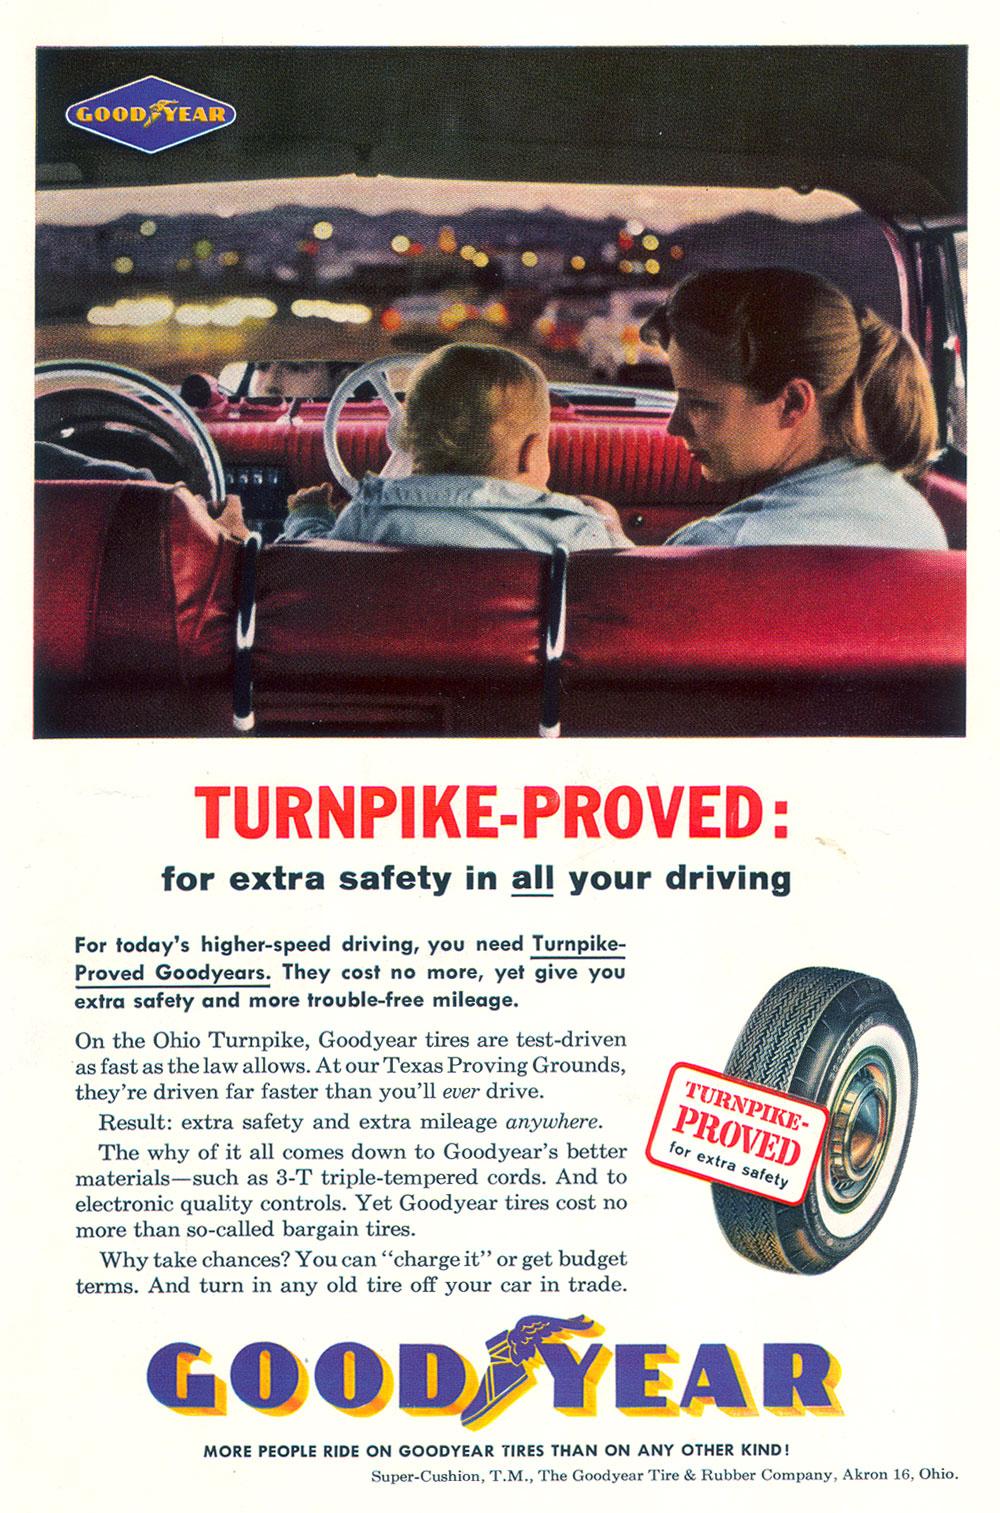 Goodyear tire advertisement